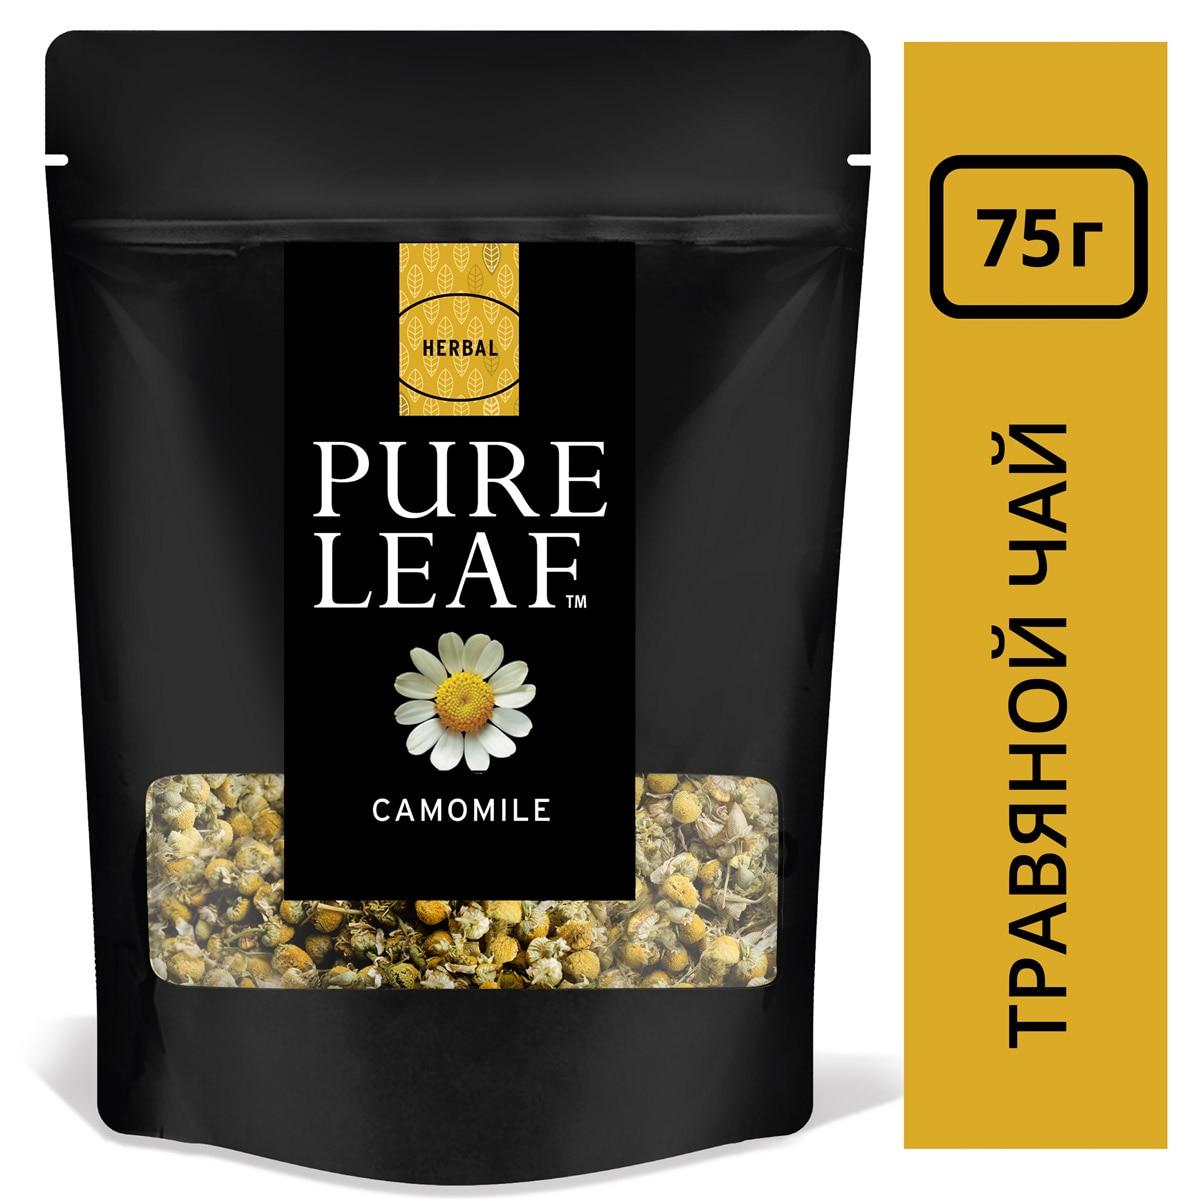 PURE LEAF травяной напиток Camomile (75г) - Крупнолистовой чай